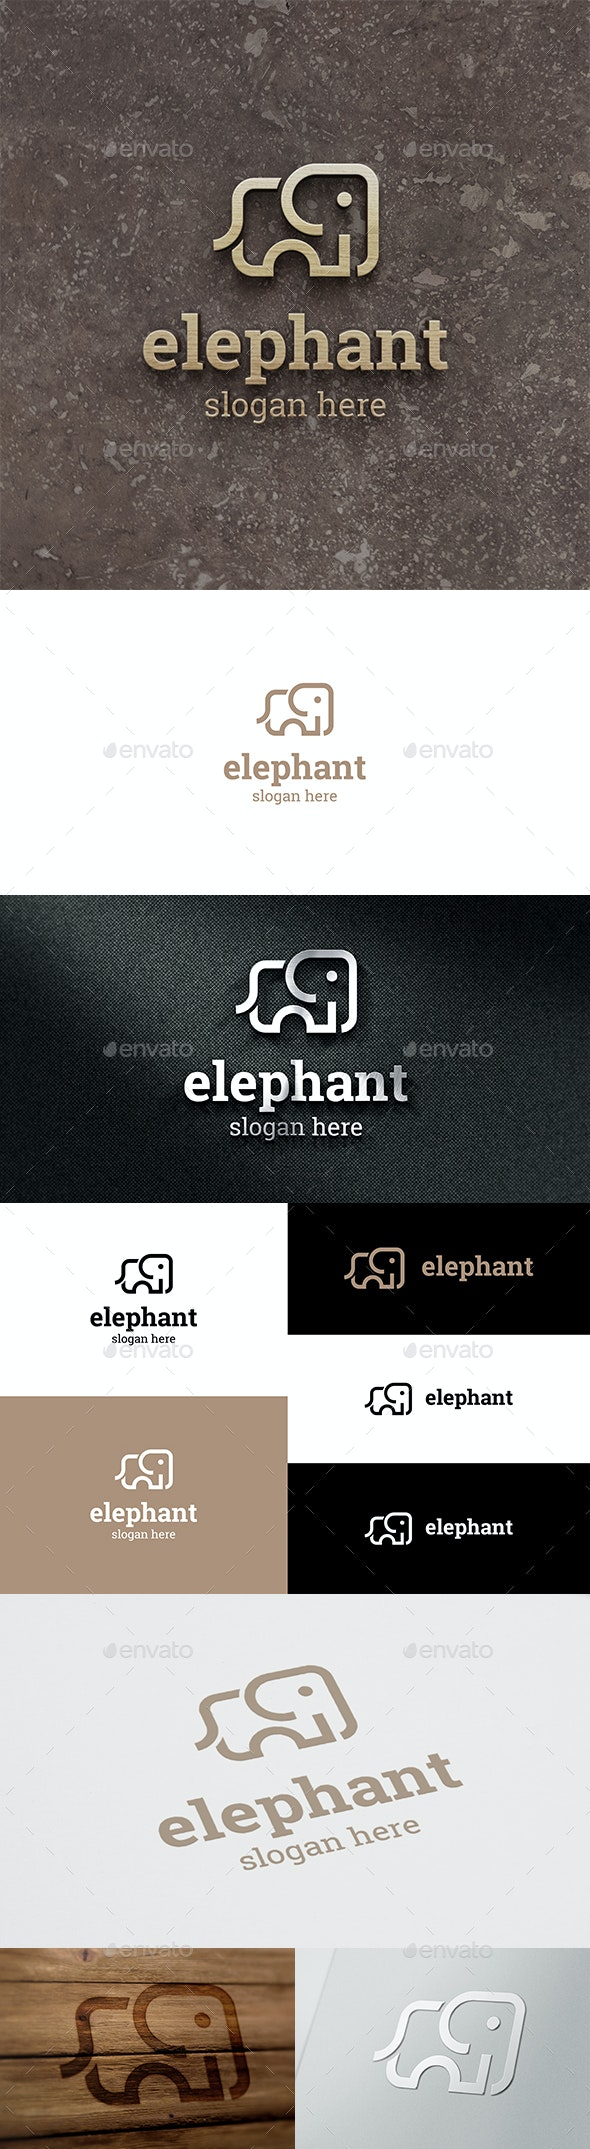 Elephant Clean and Minimal Vector Logo - Animals Logo Templates